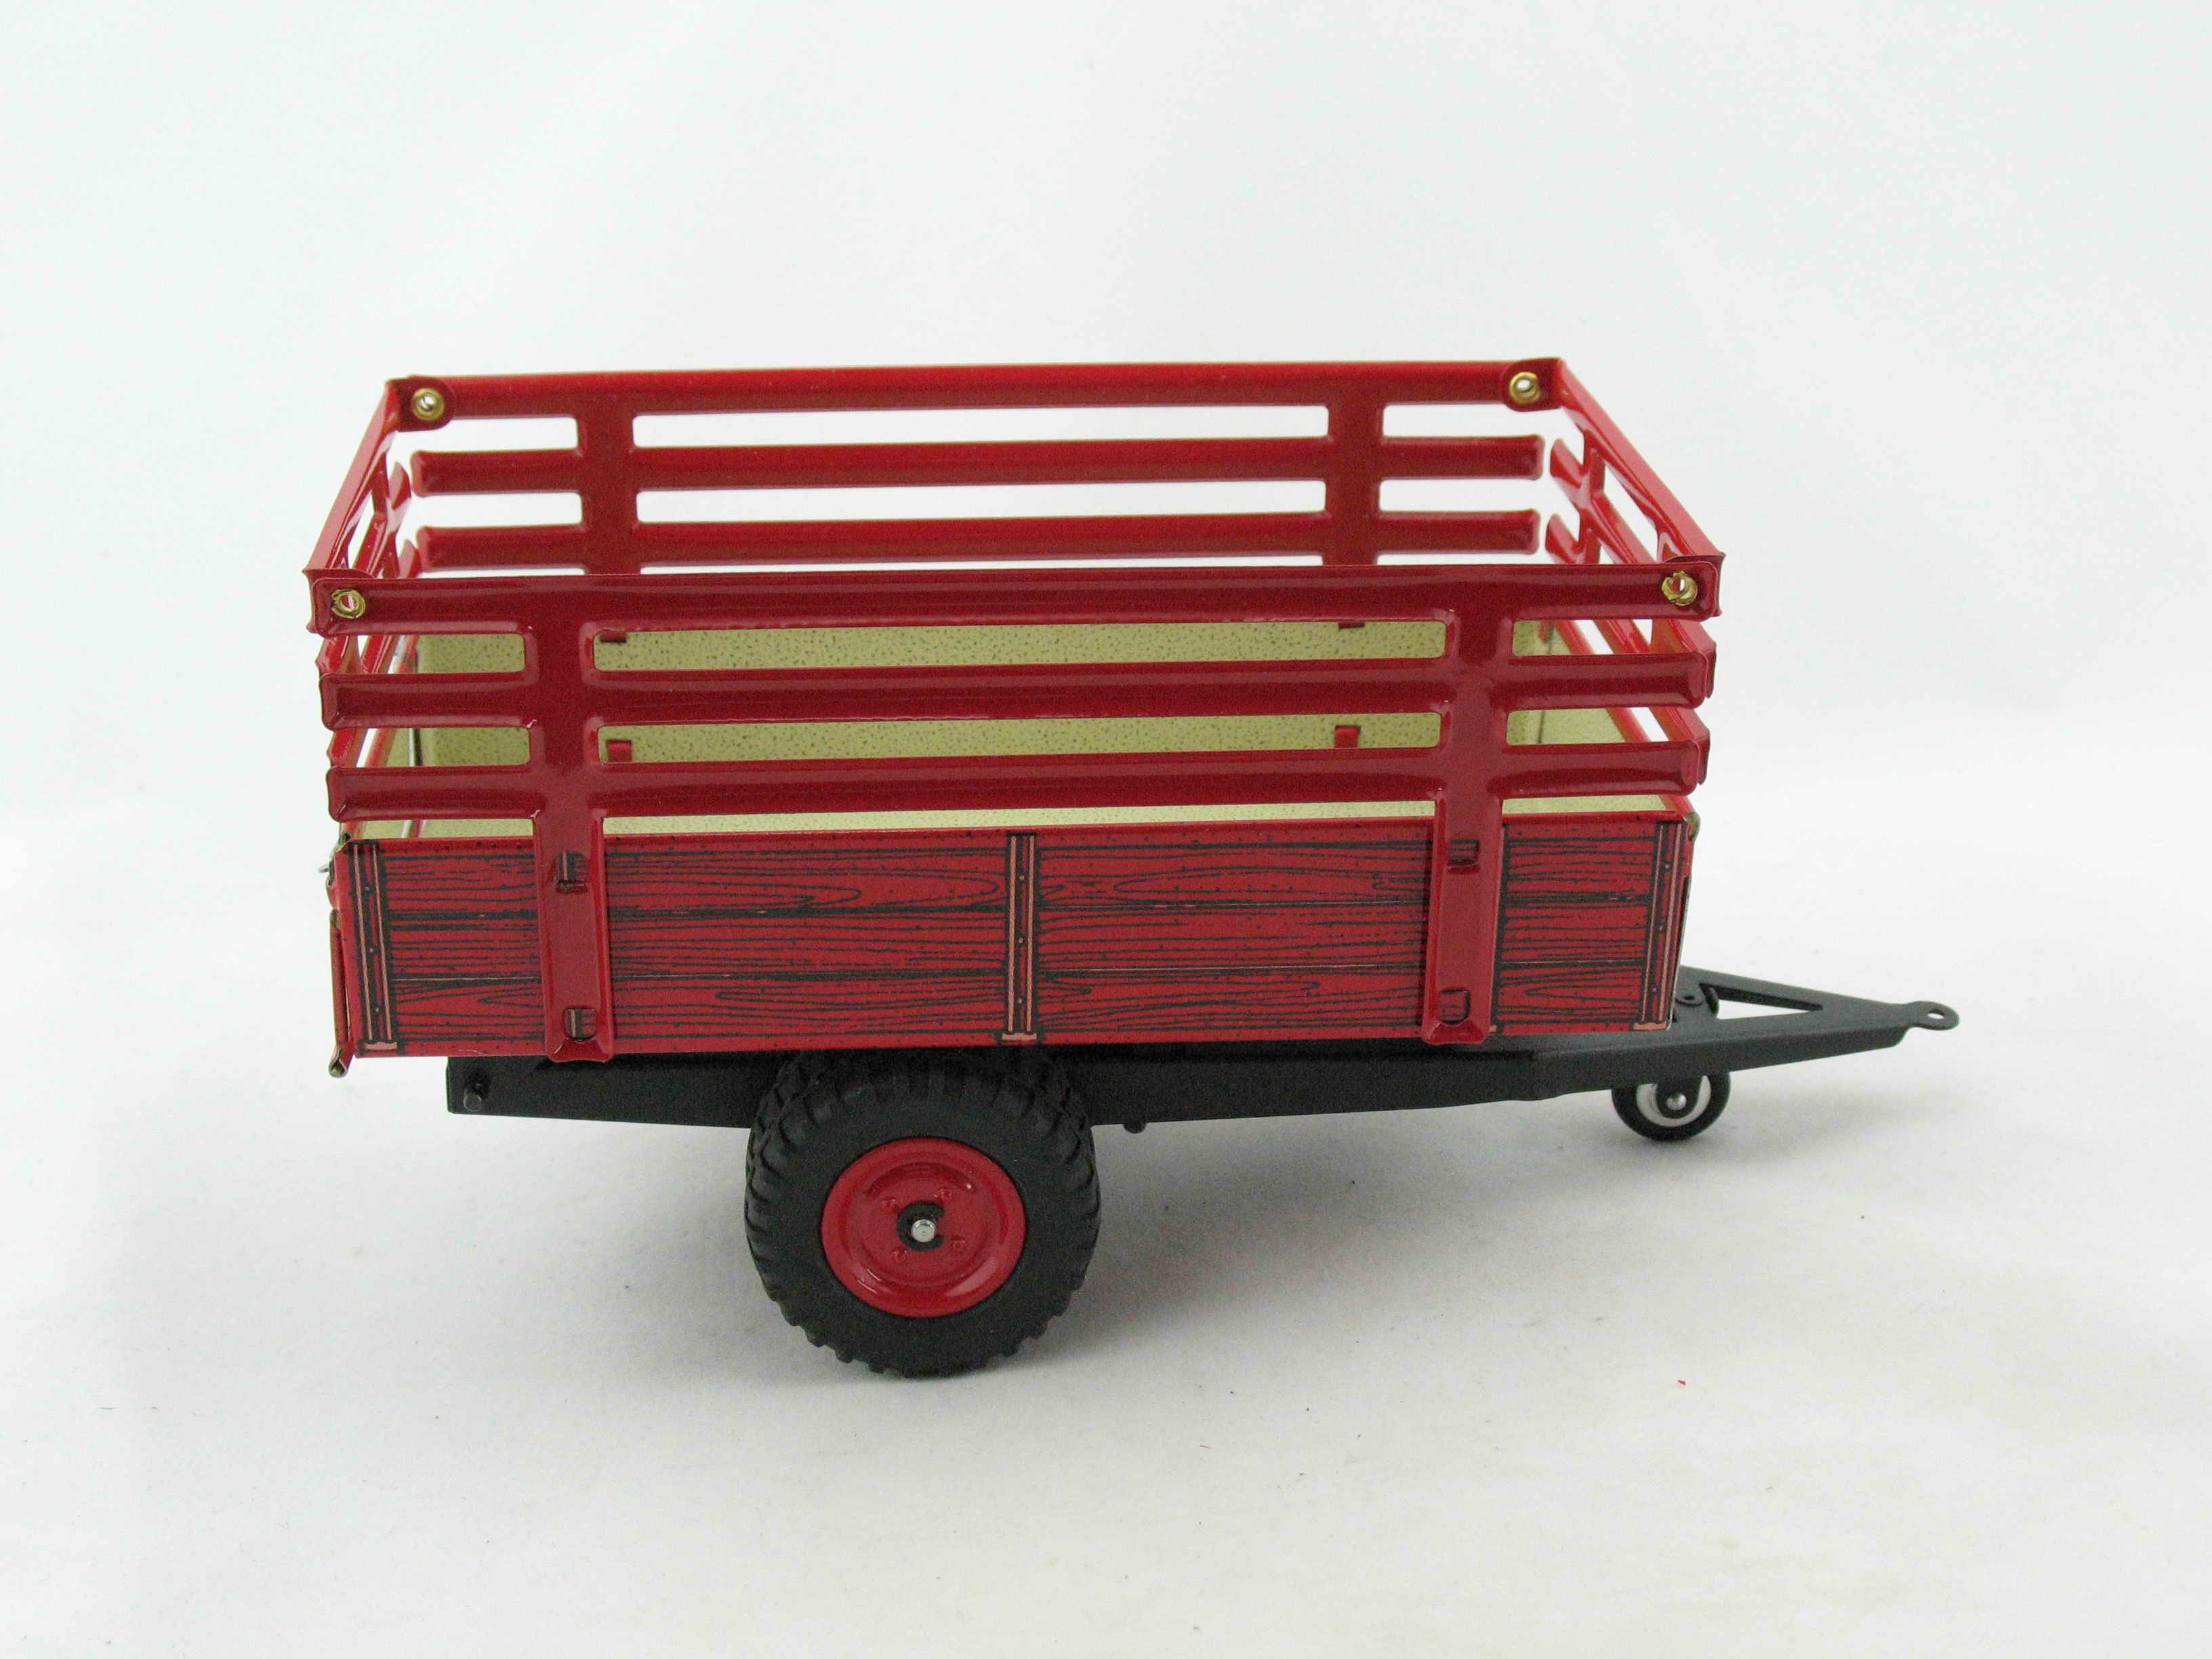 traktor anh nger kipper mit gitteraufbau von kovap. Black Bedroom Furniture Sets. Home Design Ideas